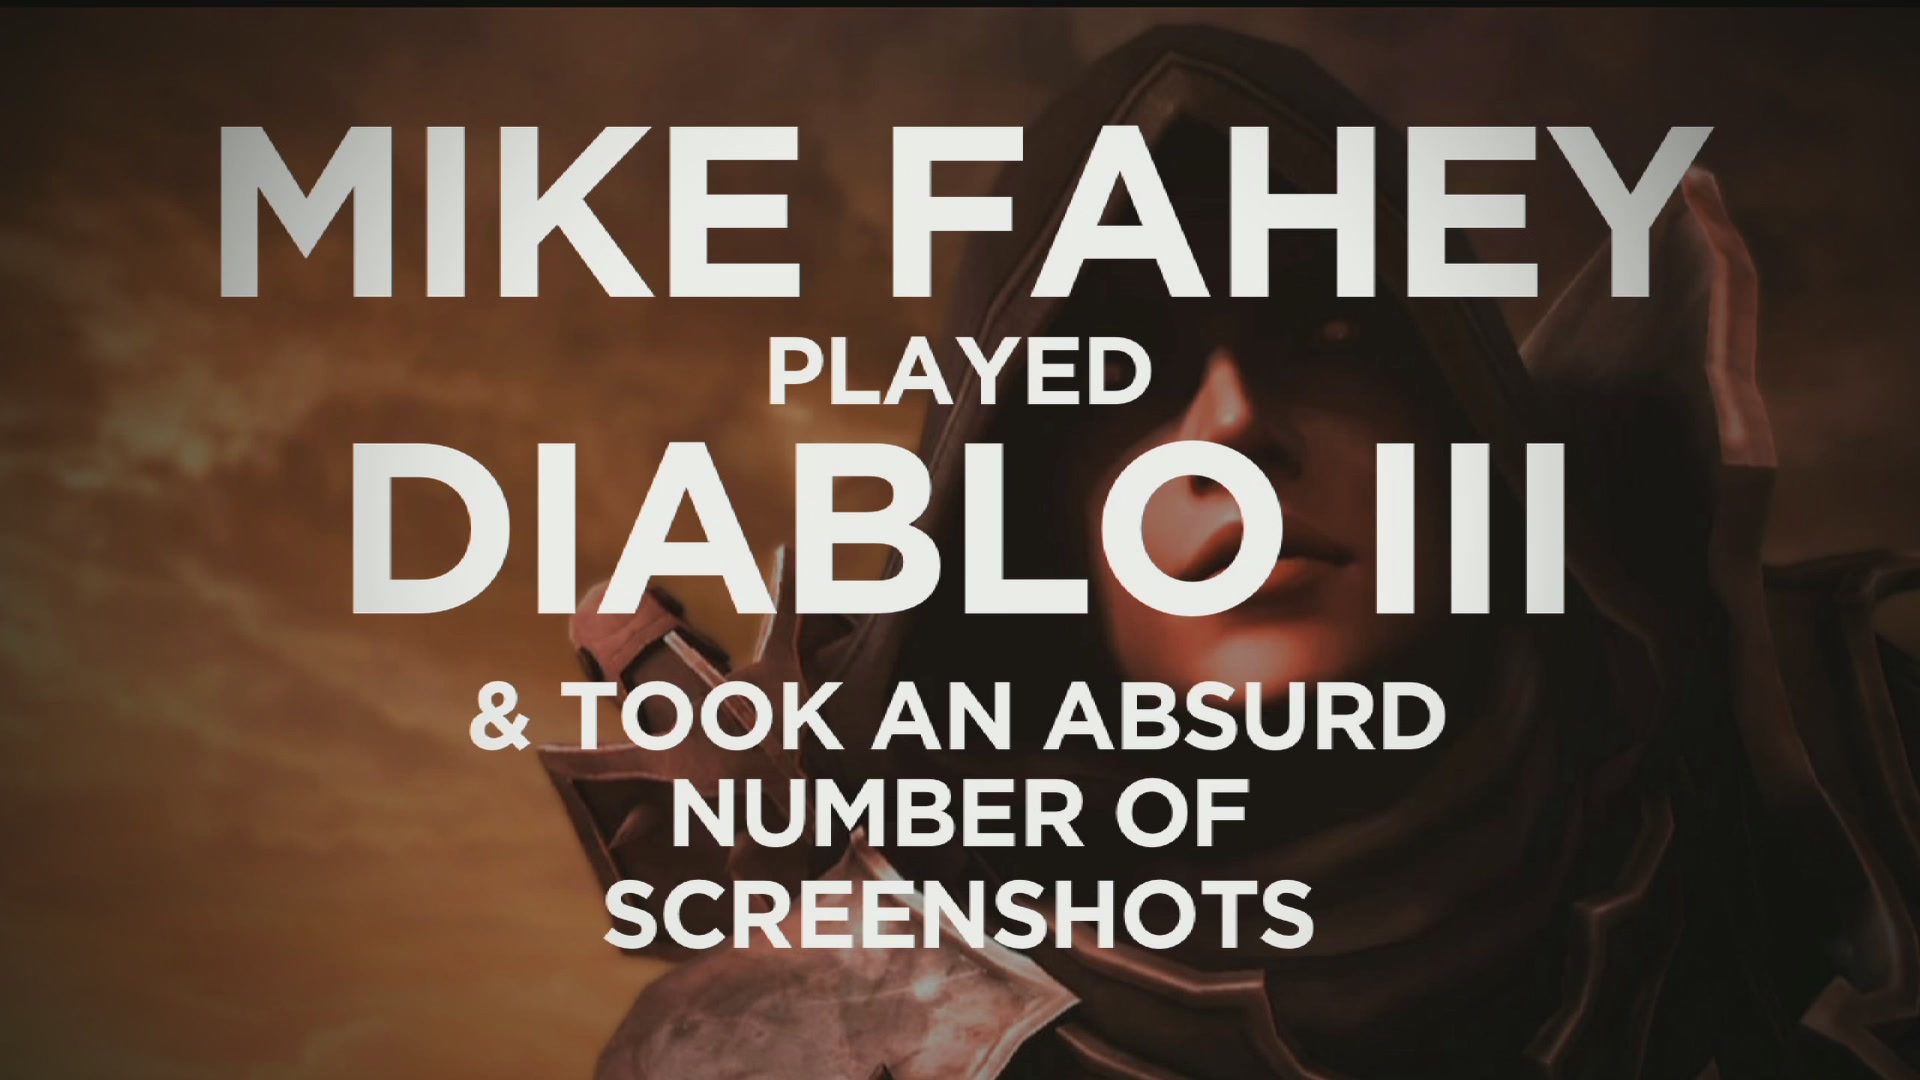 My Entire Diablo III Play Through In Under Five Minutes